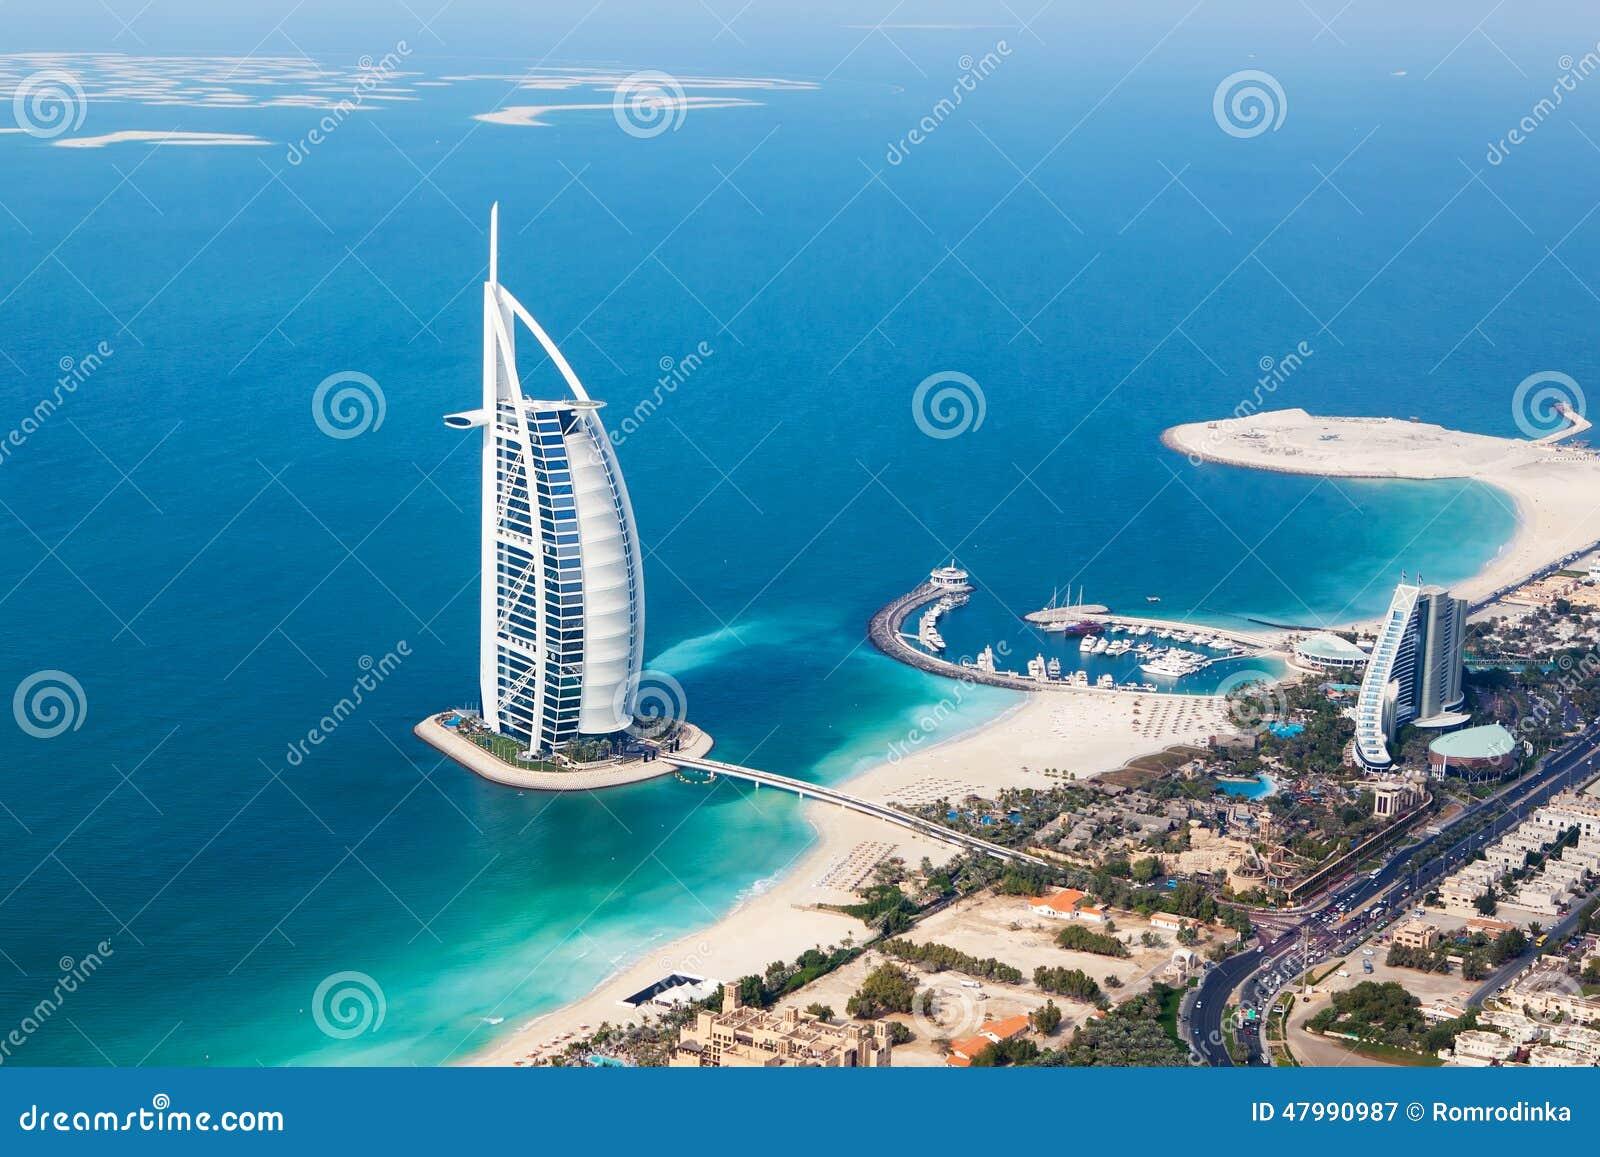 Dubai  Uae  Burj Al Arab From Helicopter View Editorial